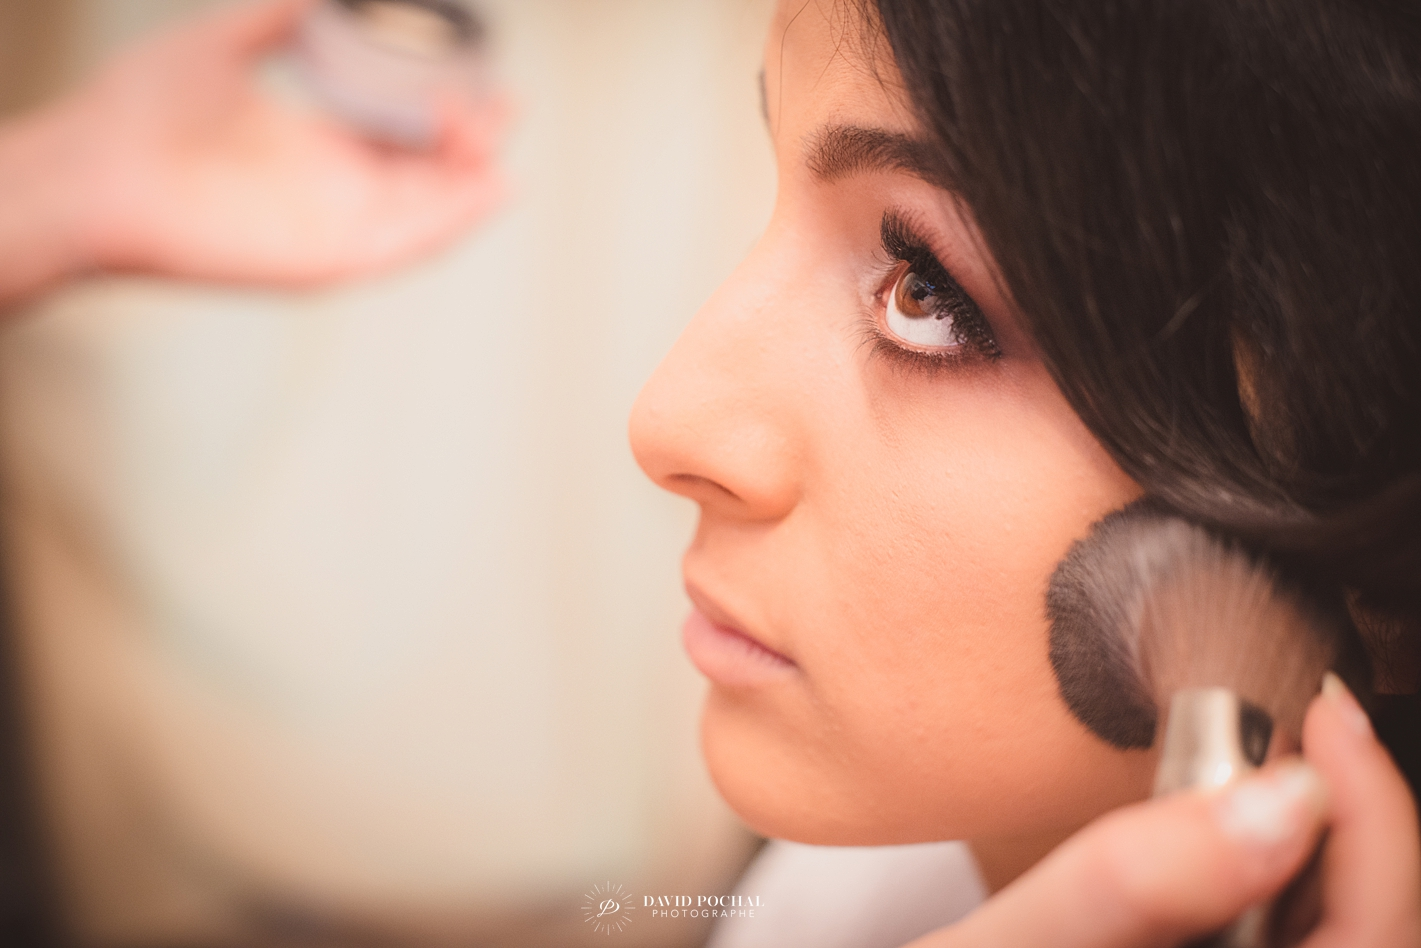 séance de maquillage.jpg